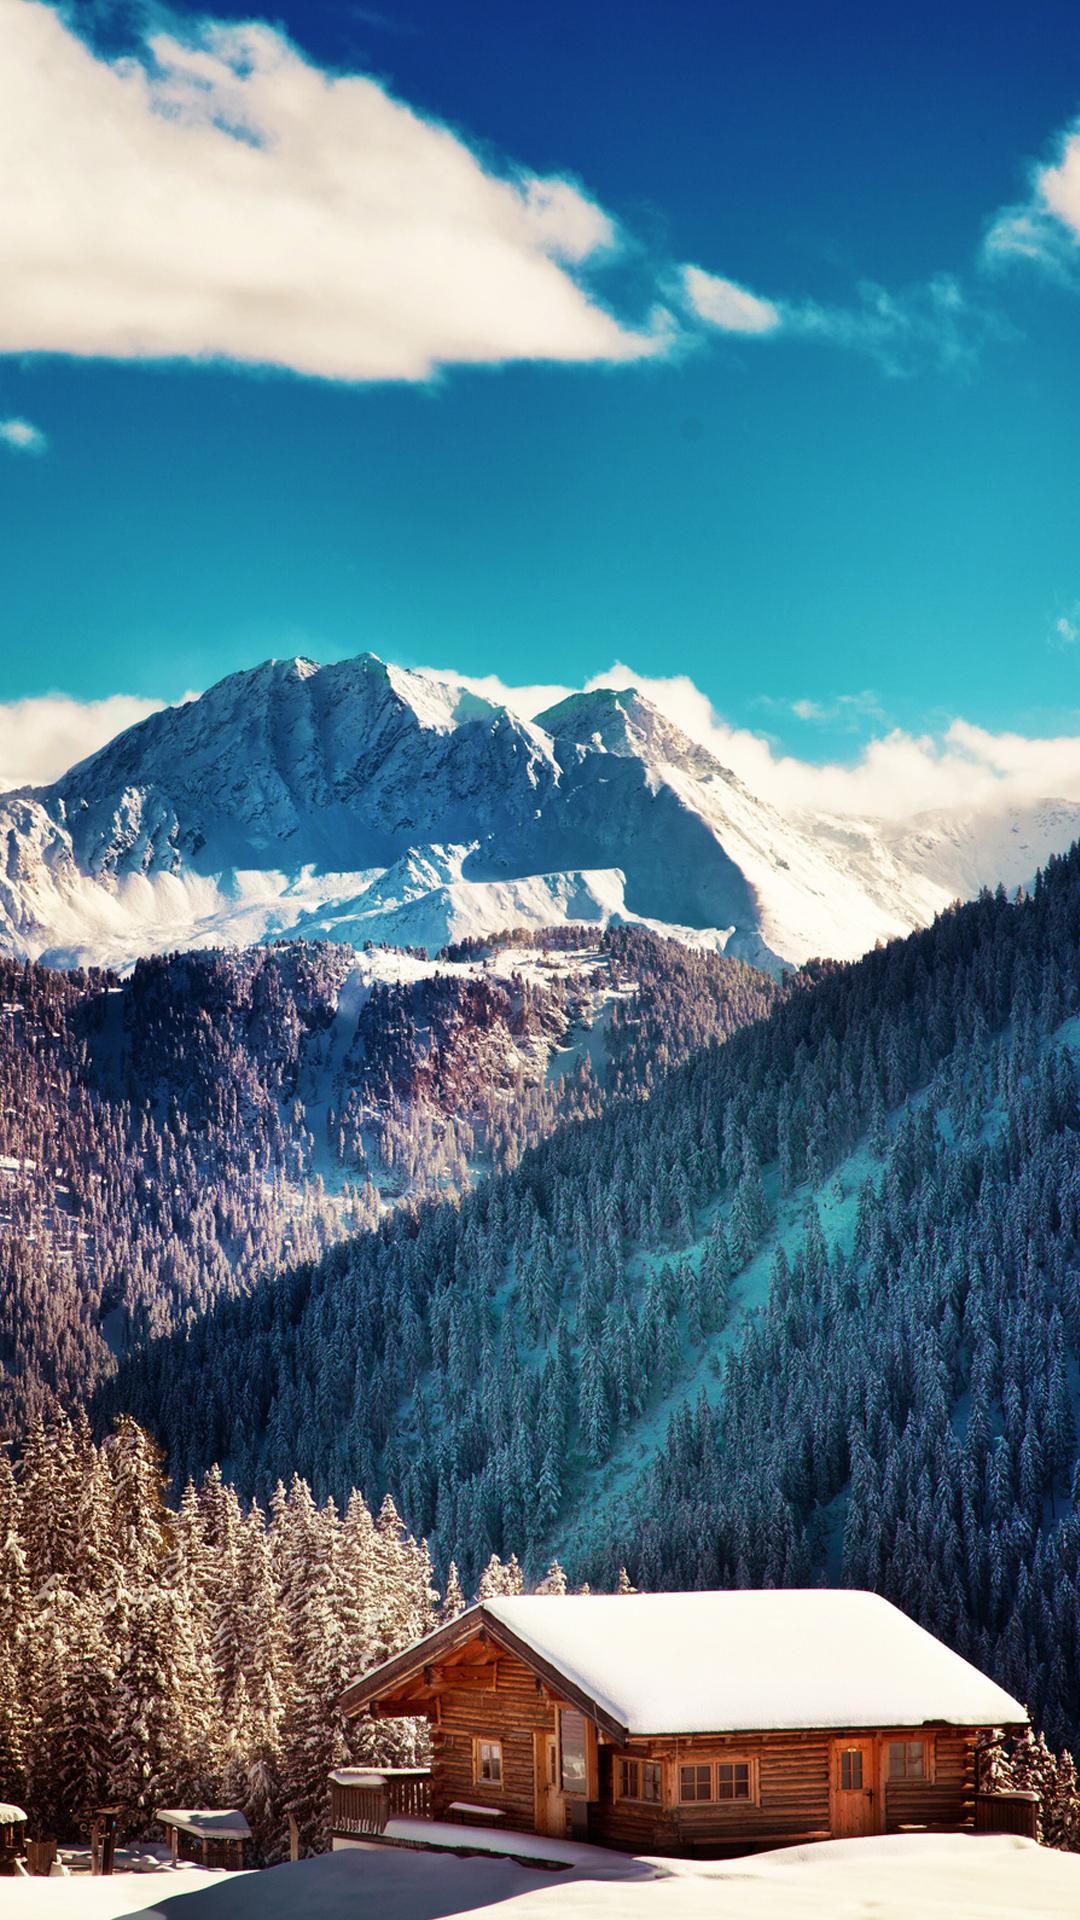 Best Wallpaper Mountain Blue - Mountains20Chalet20Blue20Sky20Android20Wallpaper  2018_11569.jpg